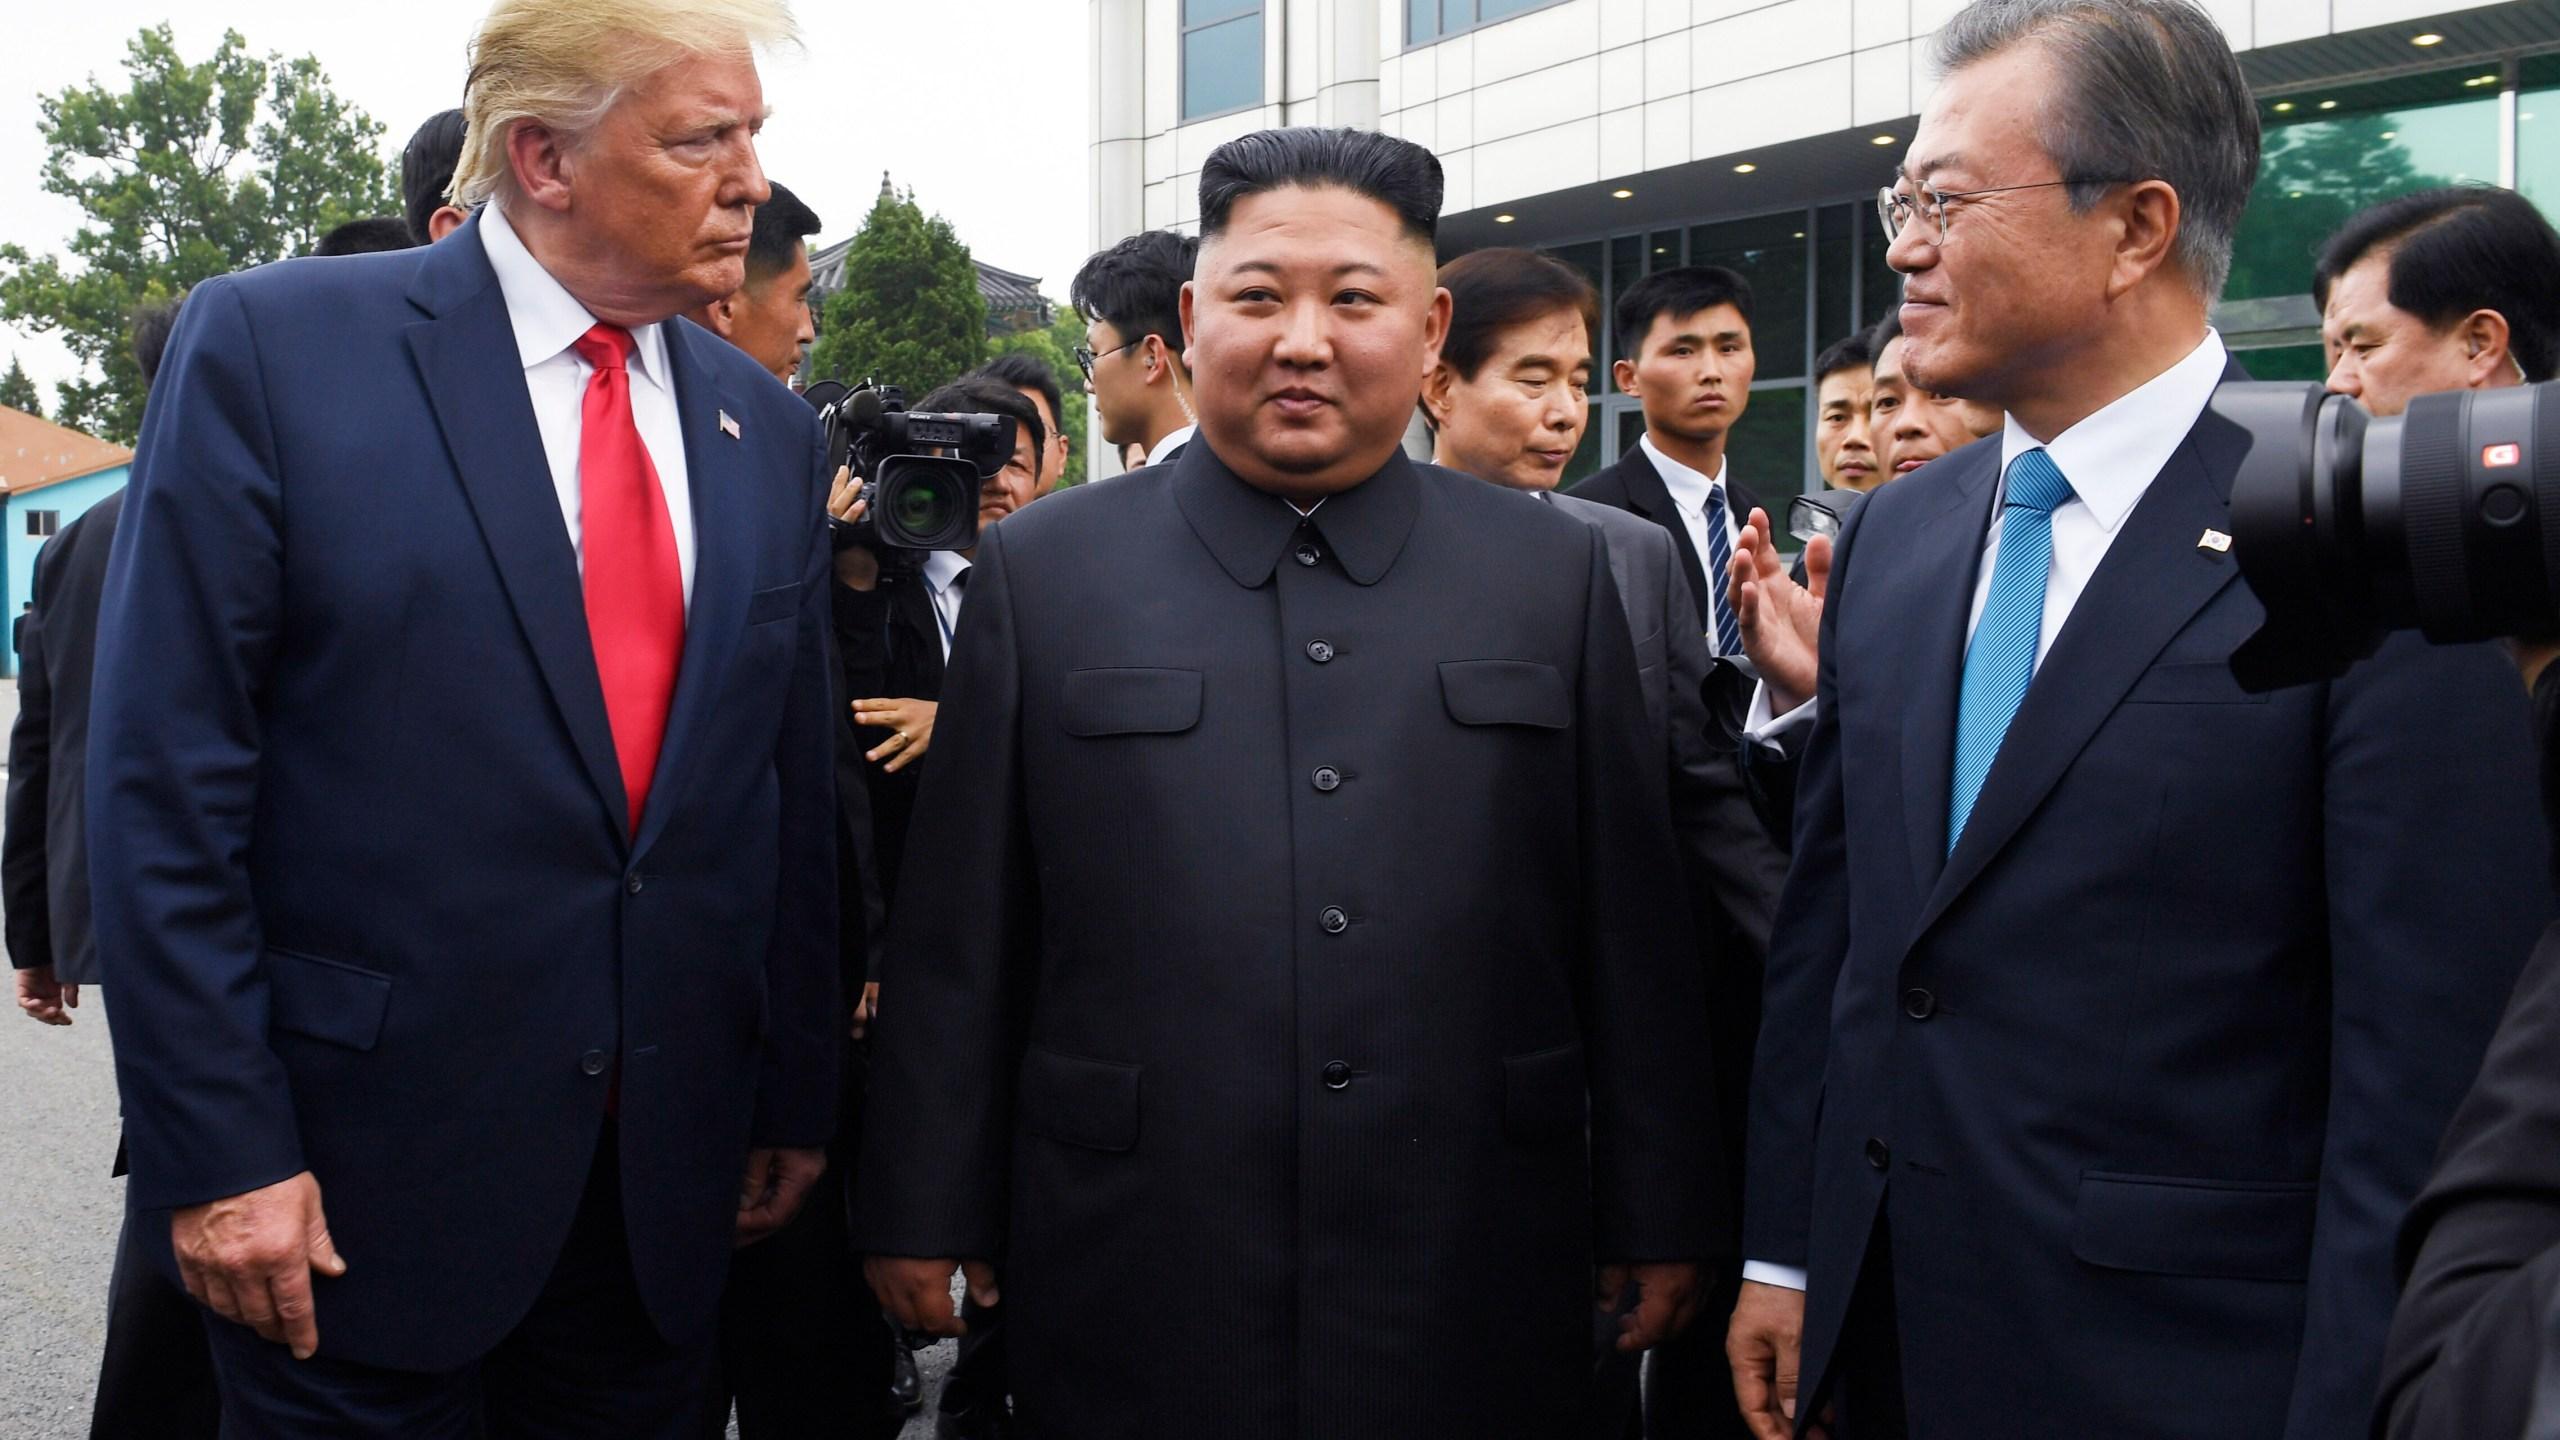 Donald Trump, Kim Jong Un, Moon Jae-in